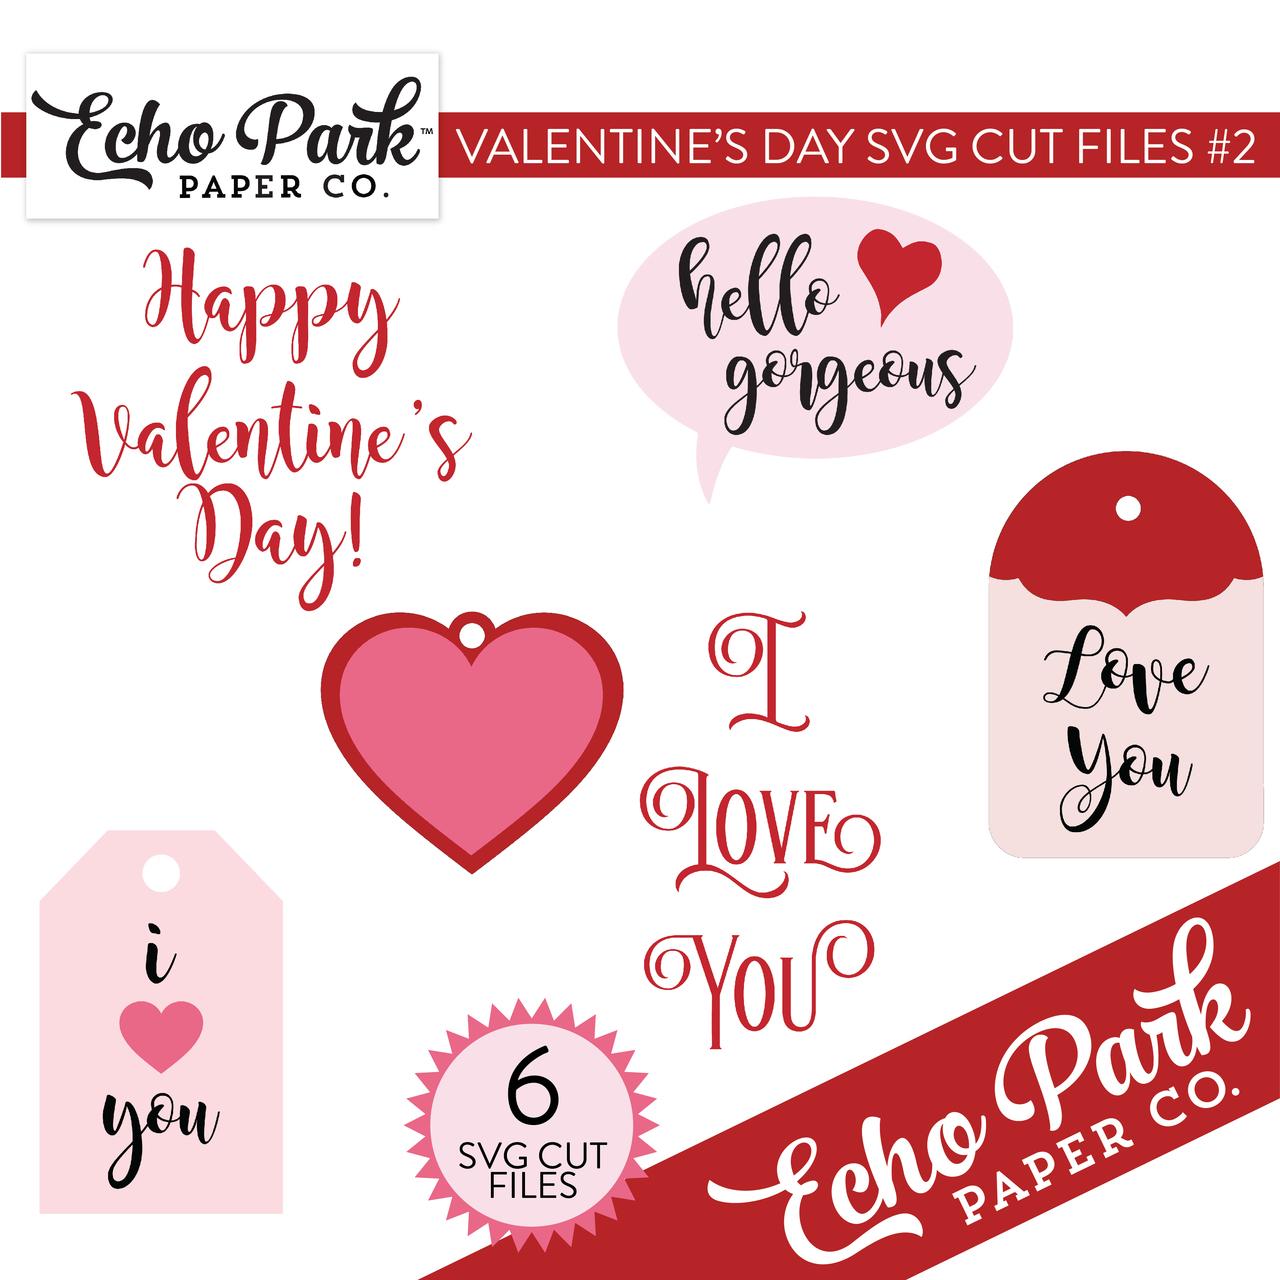 Valentines SVG Cut Files #2